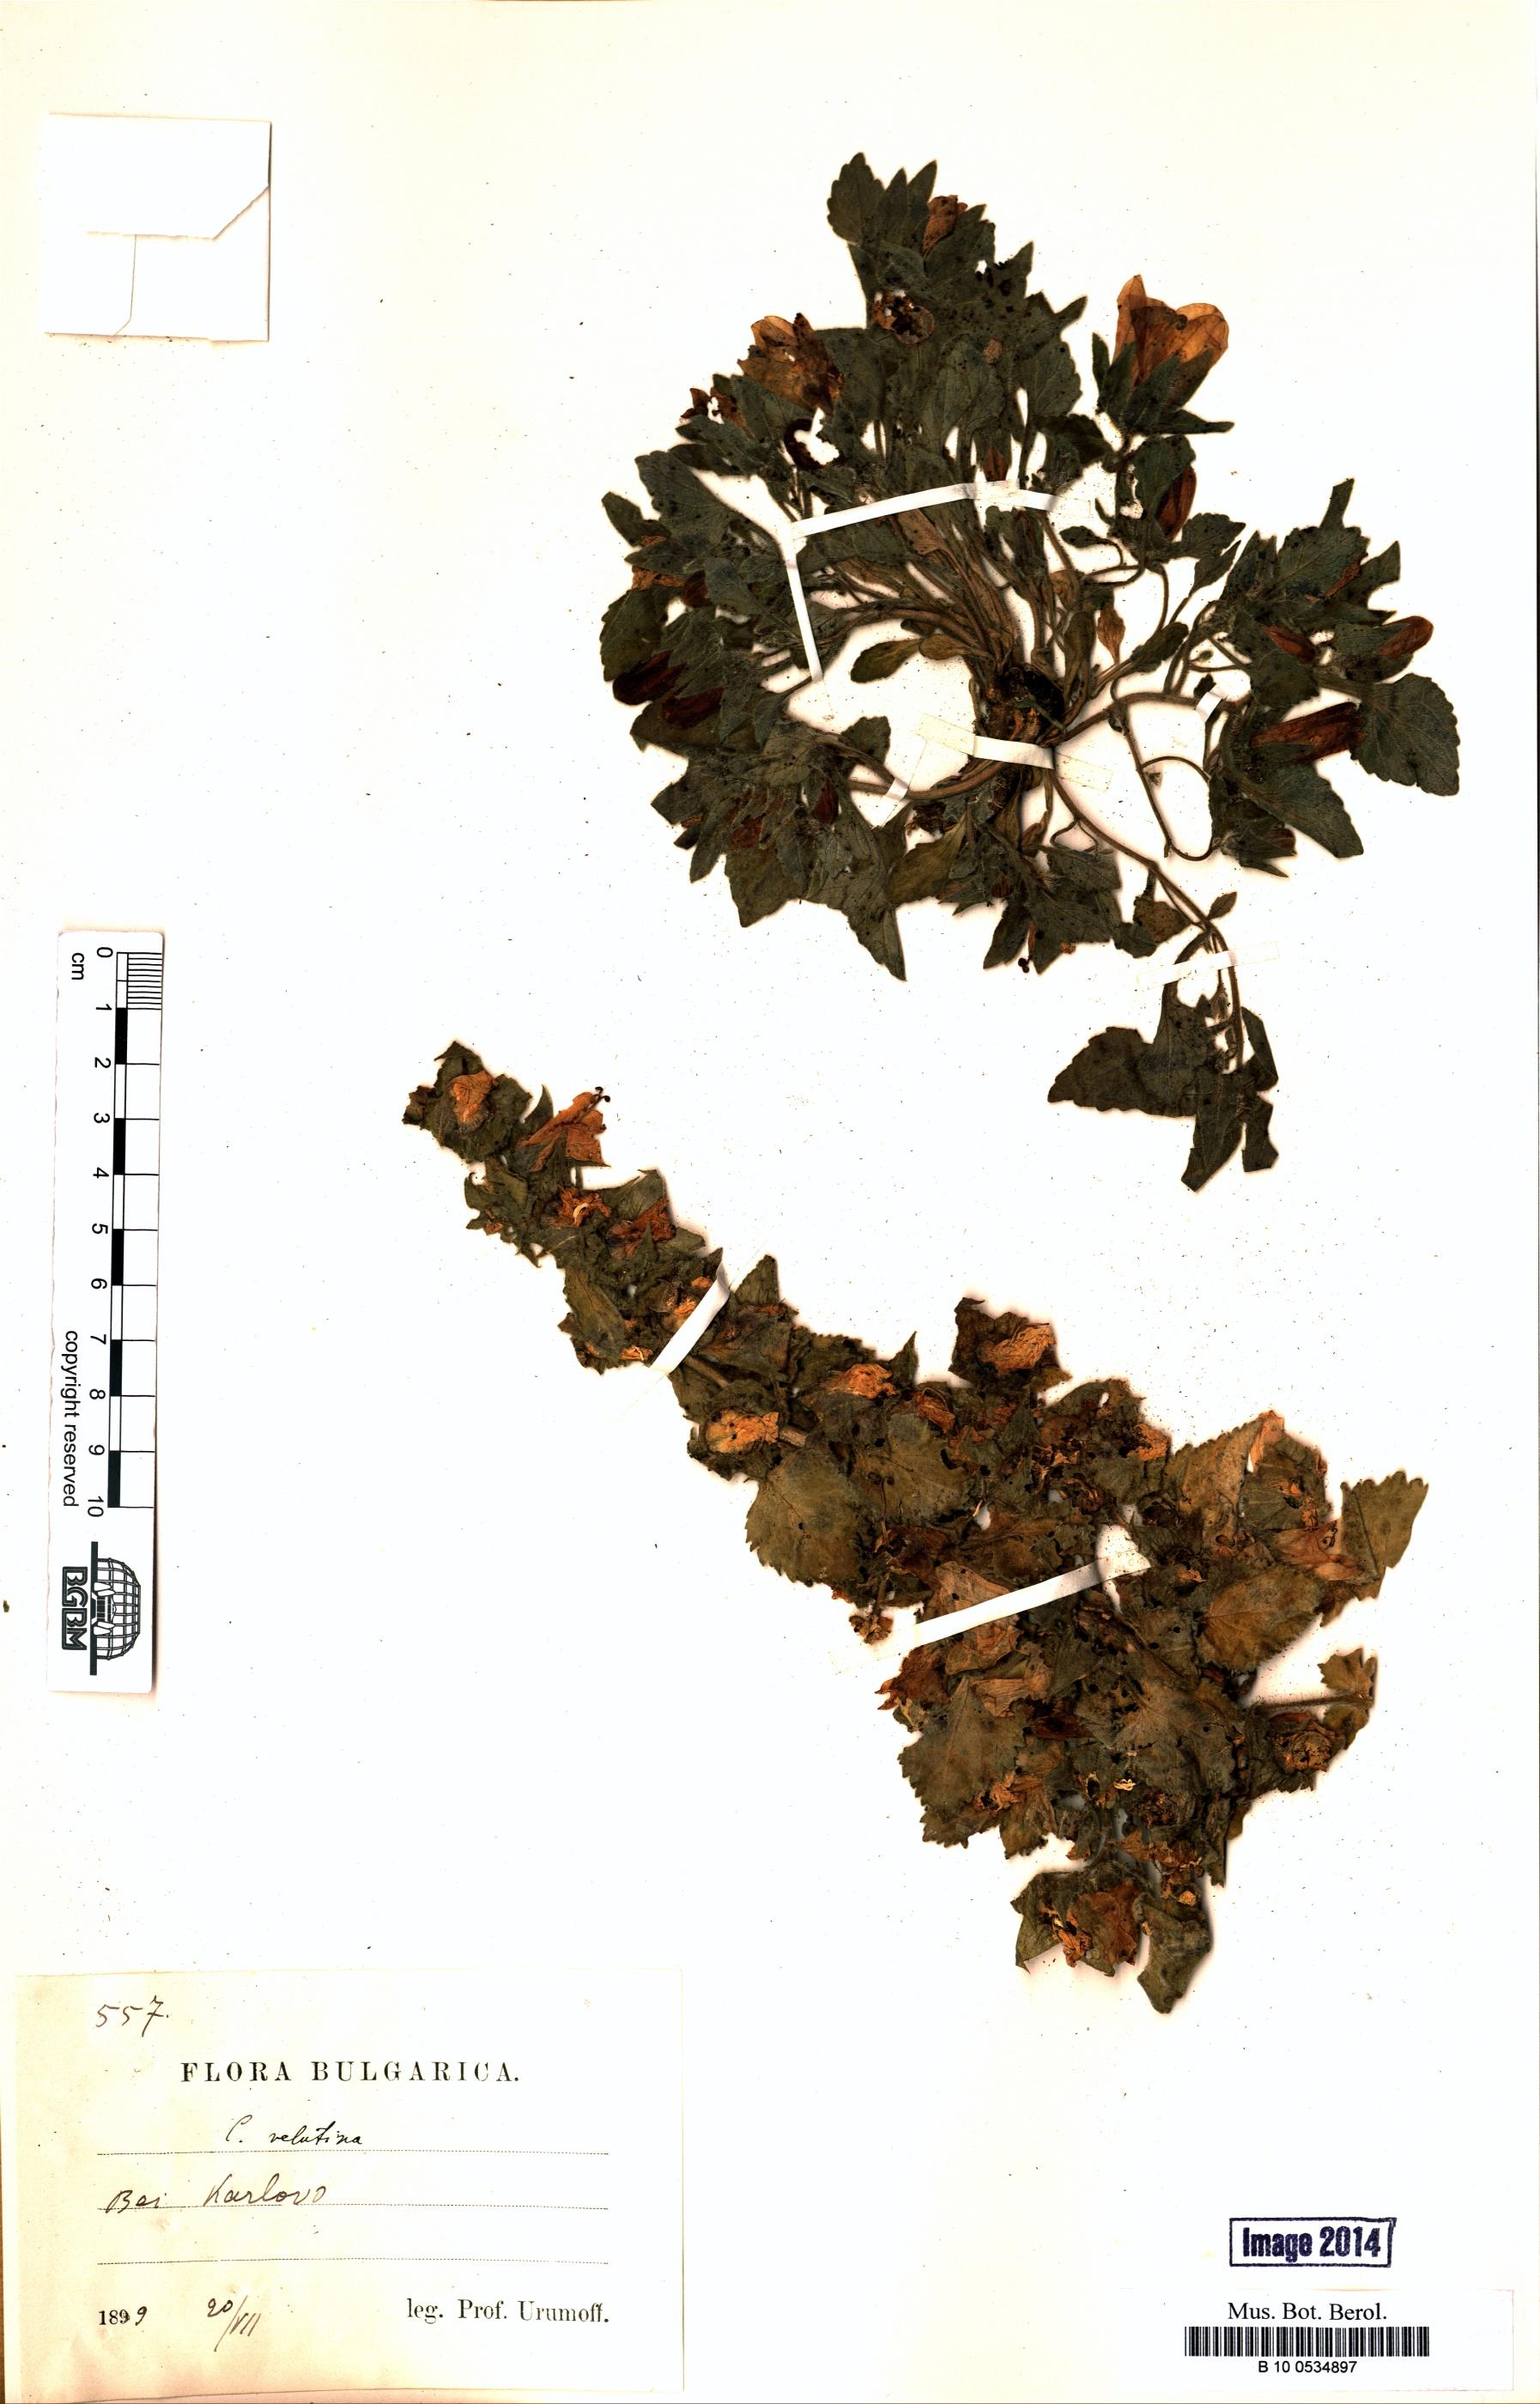 http://ww2.bgbm.org/herbarium/images/B/10/05/34/89/B_10_0534897.jpg